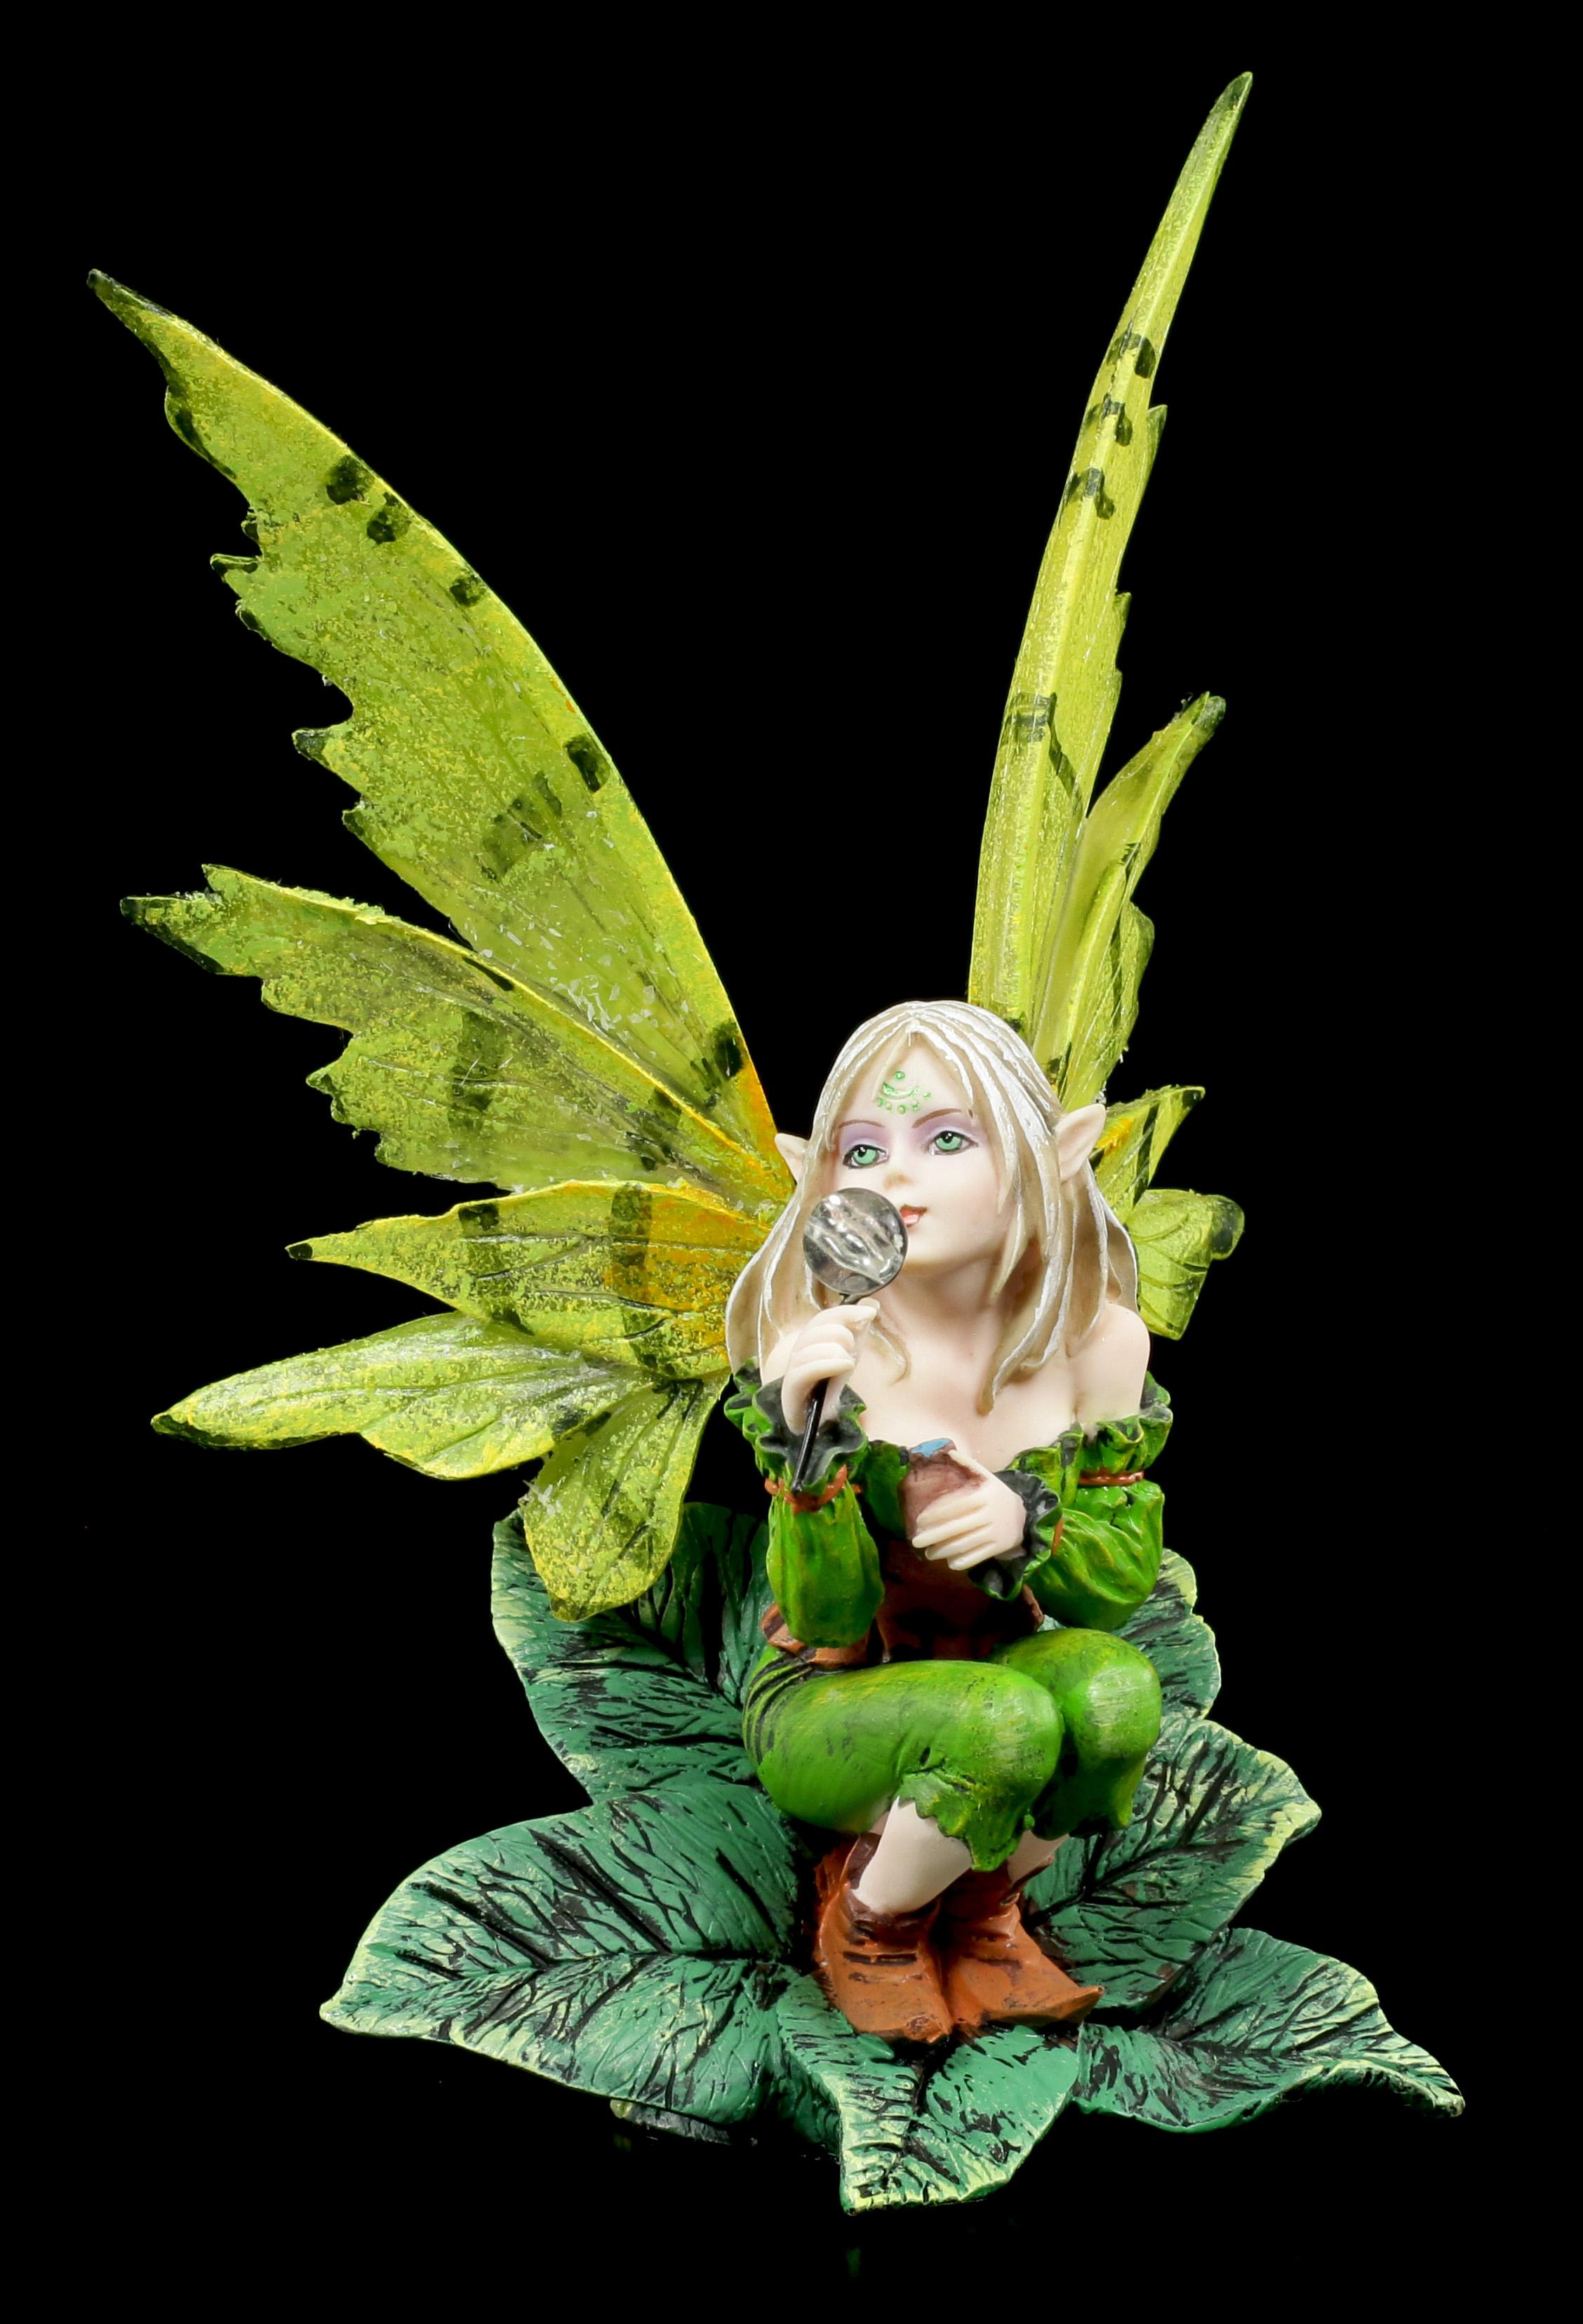 Fantasy Fee Statue Magie Elfen Figur mit Drache Bad Dragon by Amy Brown